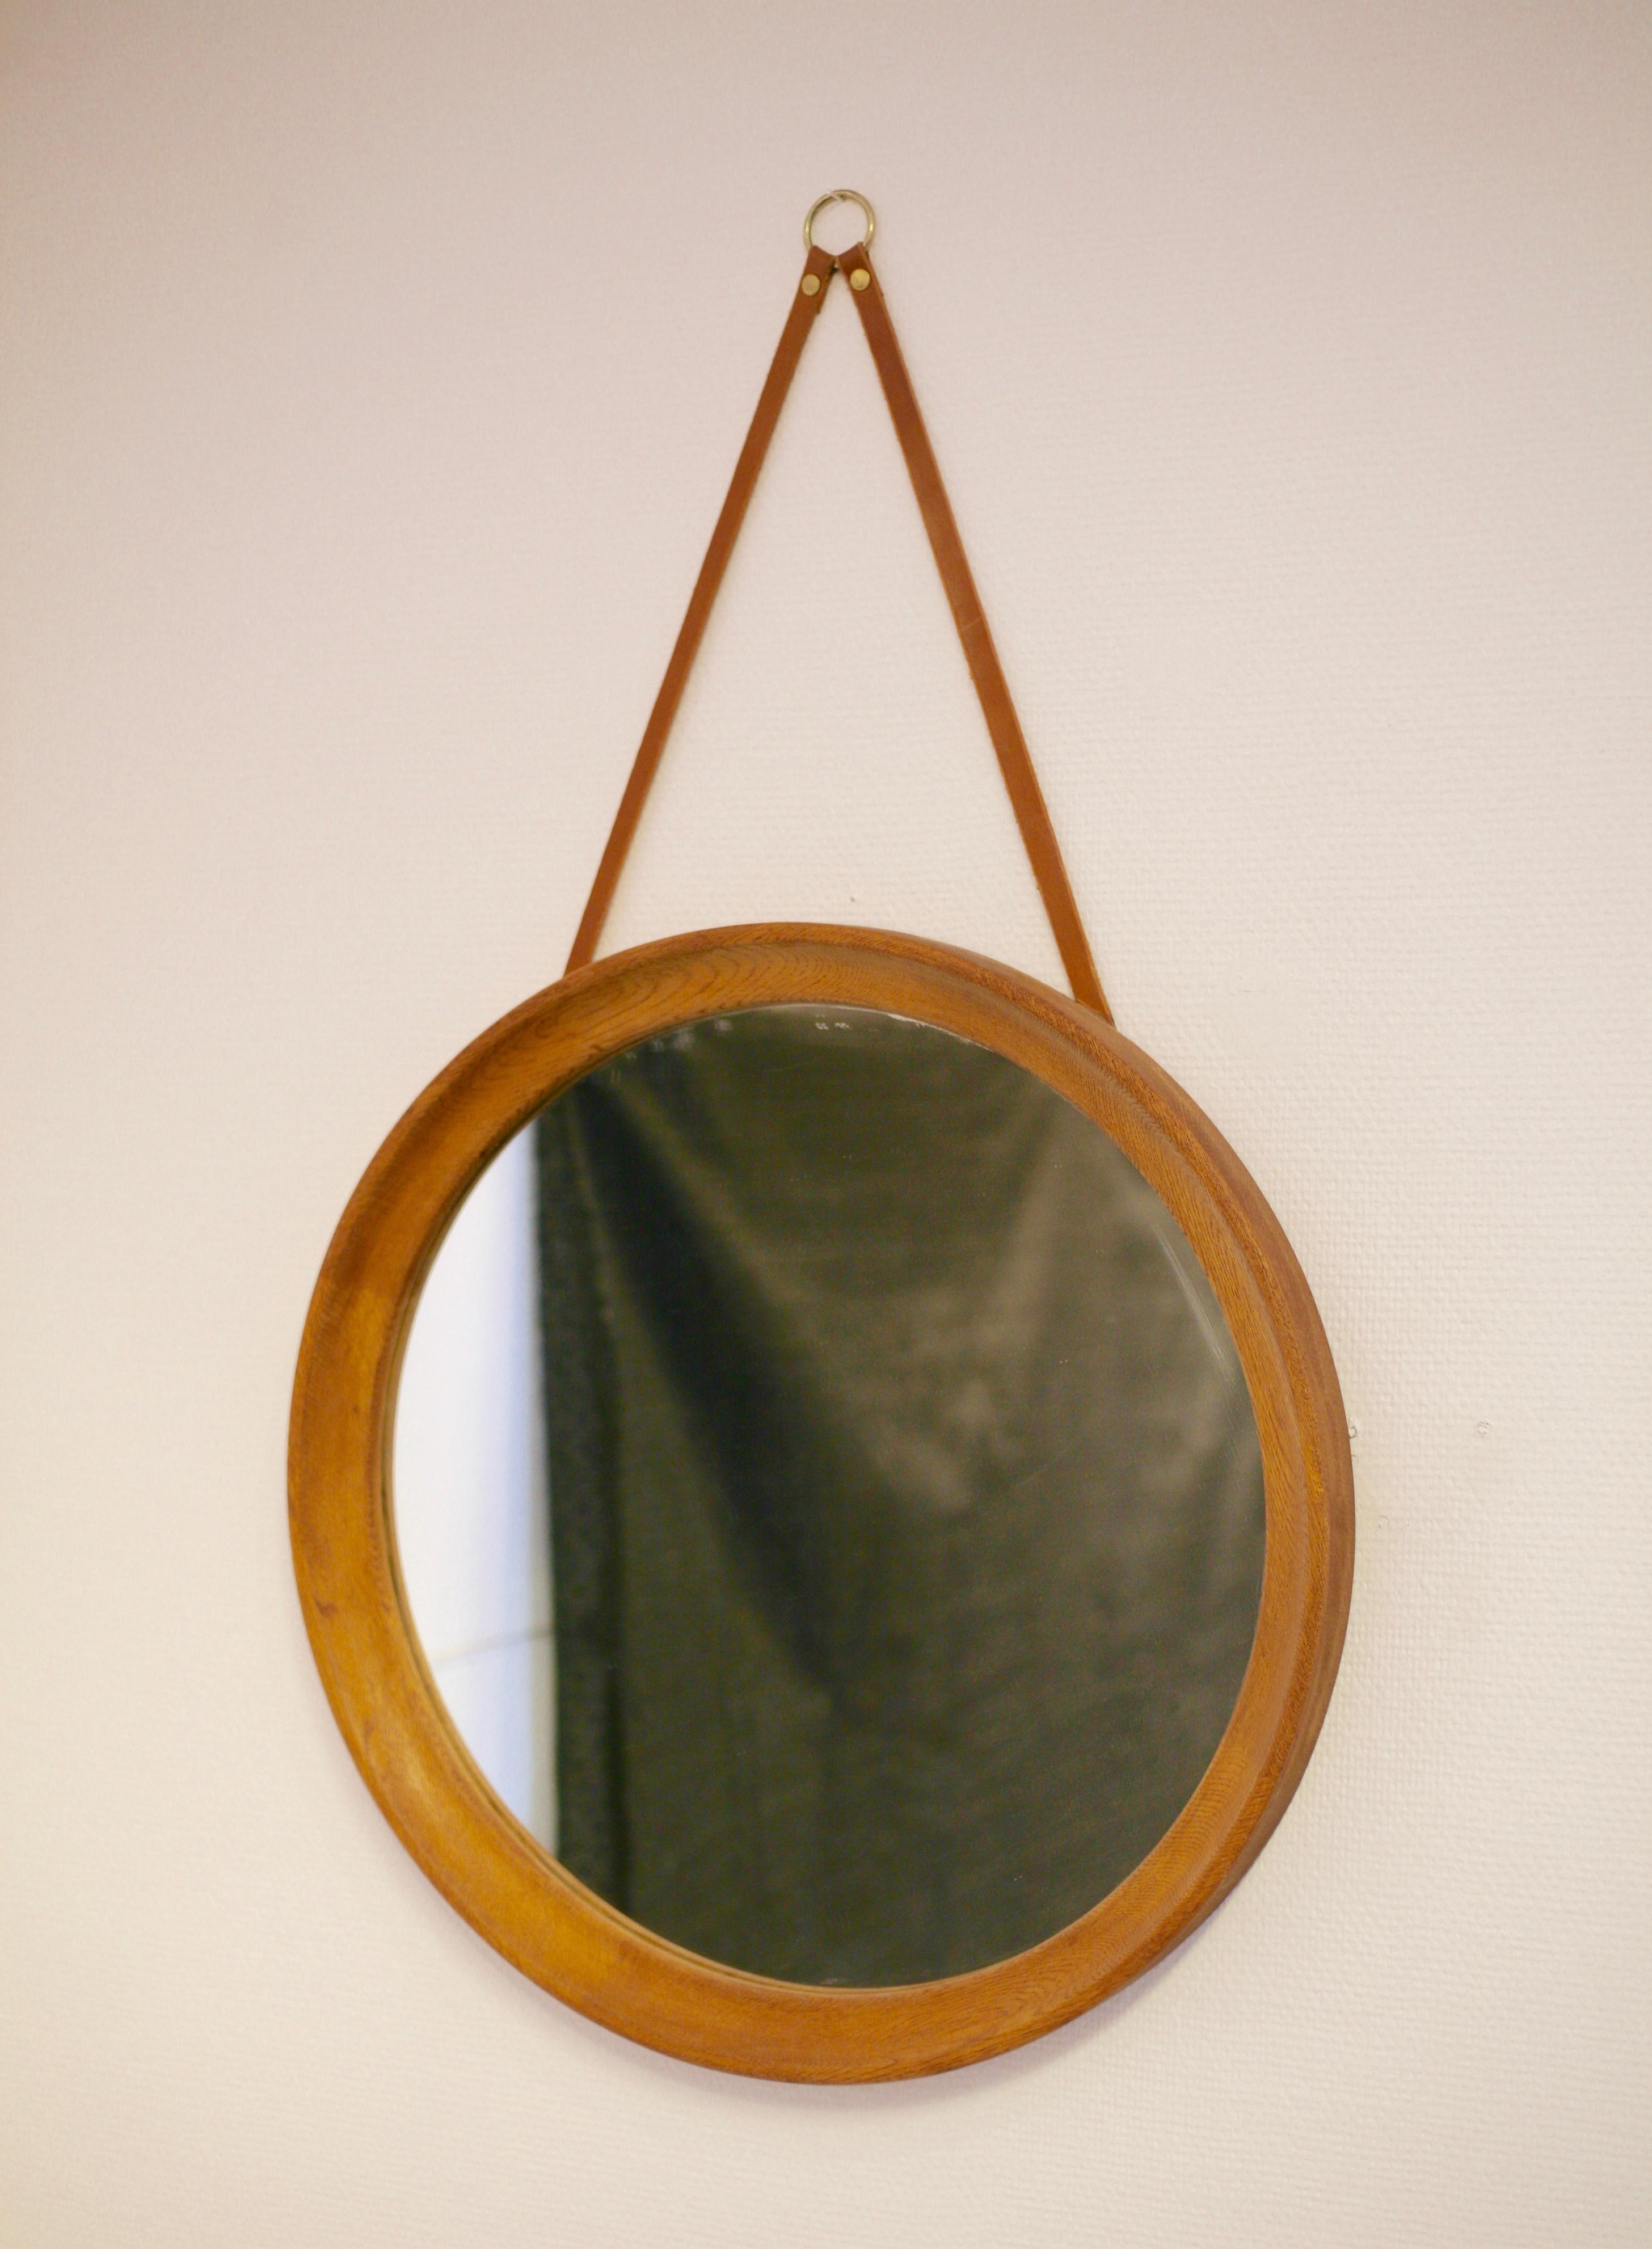 Oak mirror by Uno & Östen Kristiansson, Vittsjö, Sweden